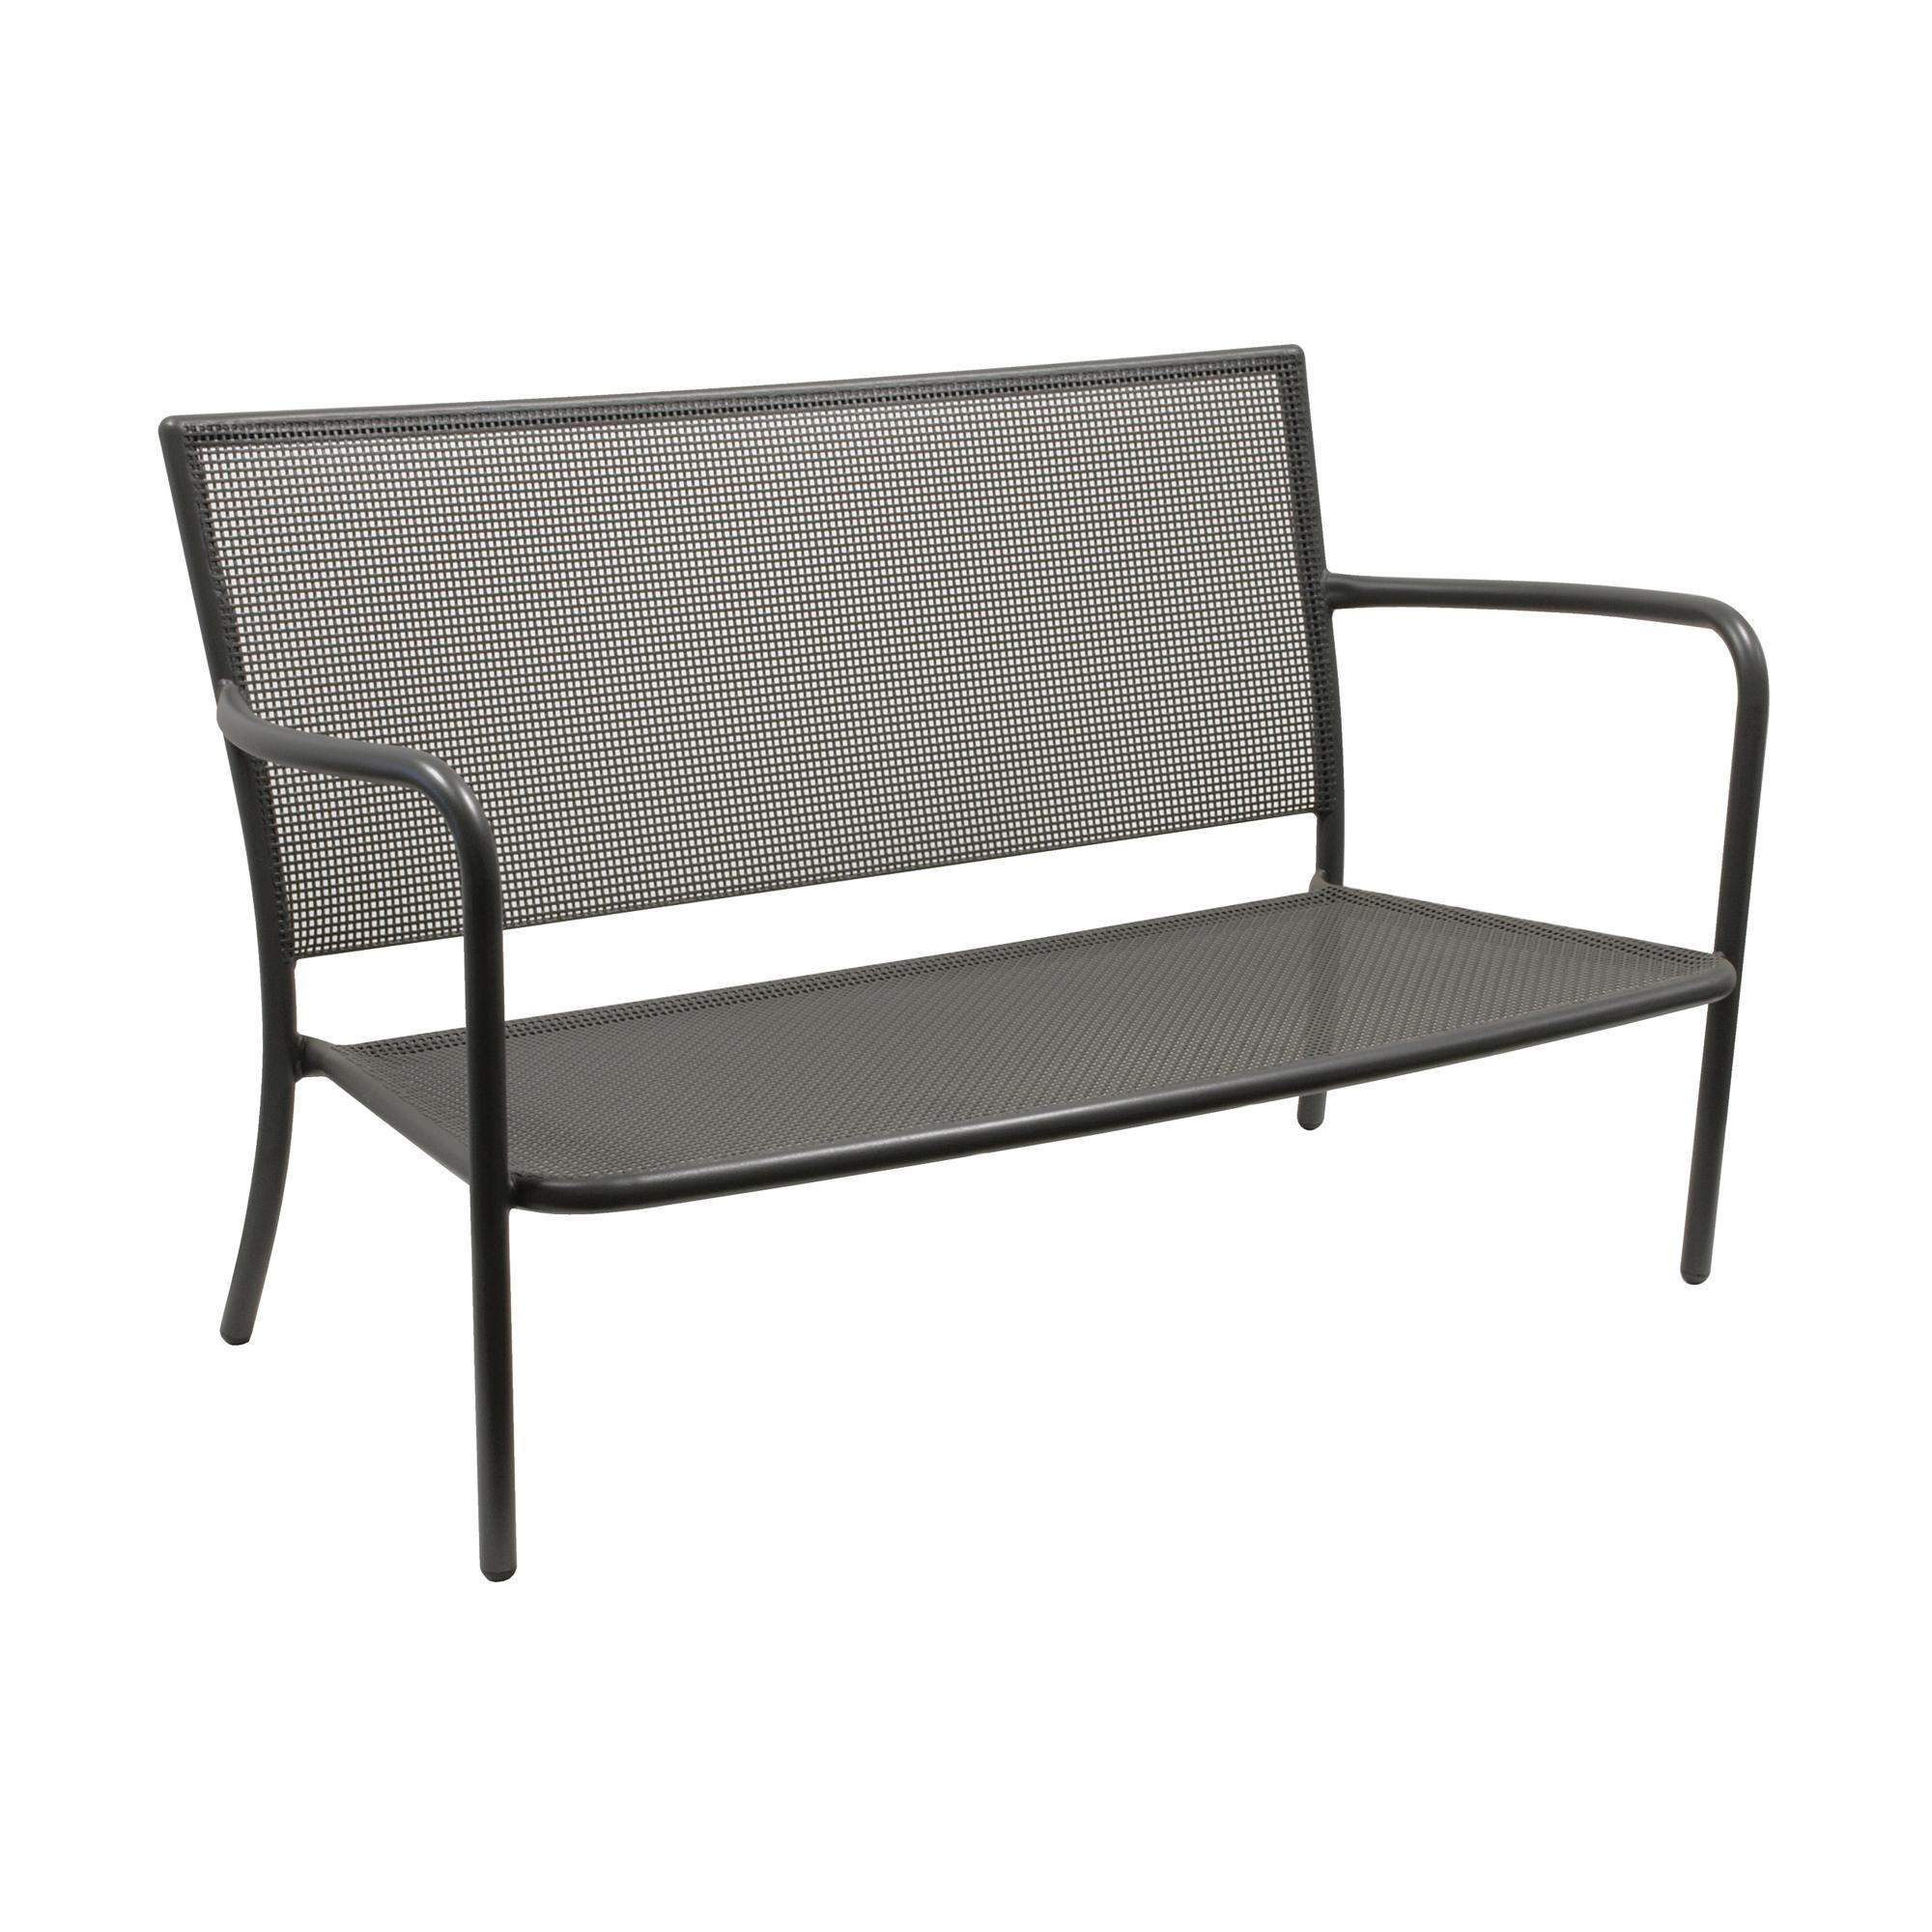 ... Emu   Athena 2 Seater Garden Sofa   Antique Iron/powder Coated/ ...